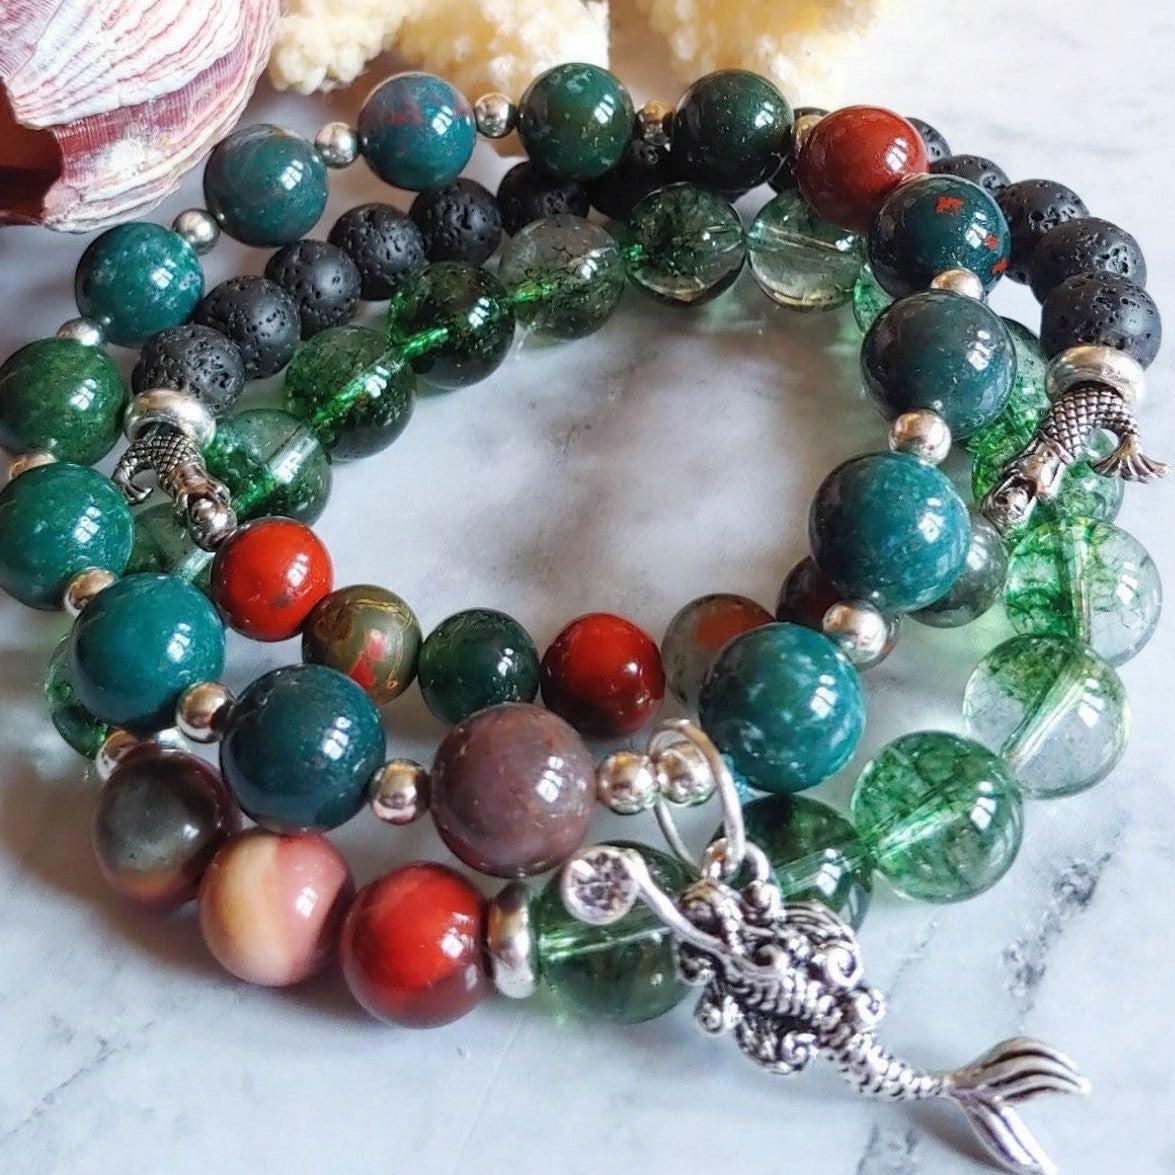 Mermaid Crystal Bloodstone Lava Bracelet